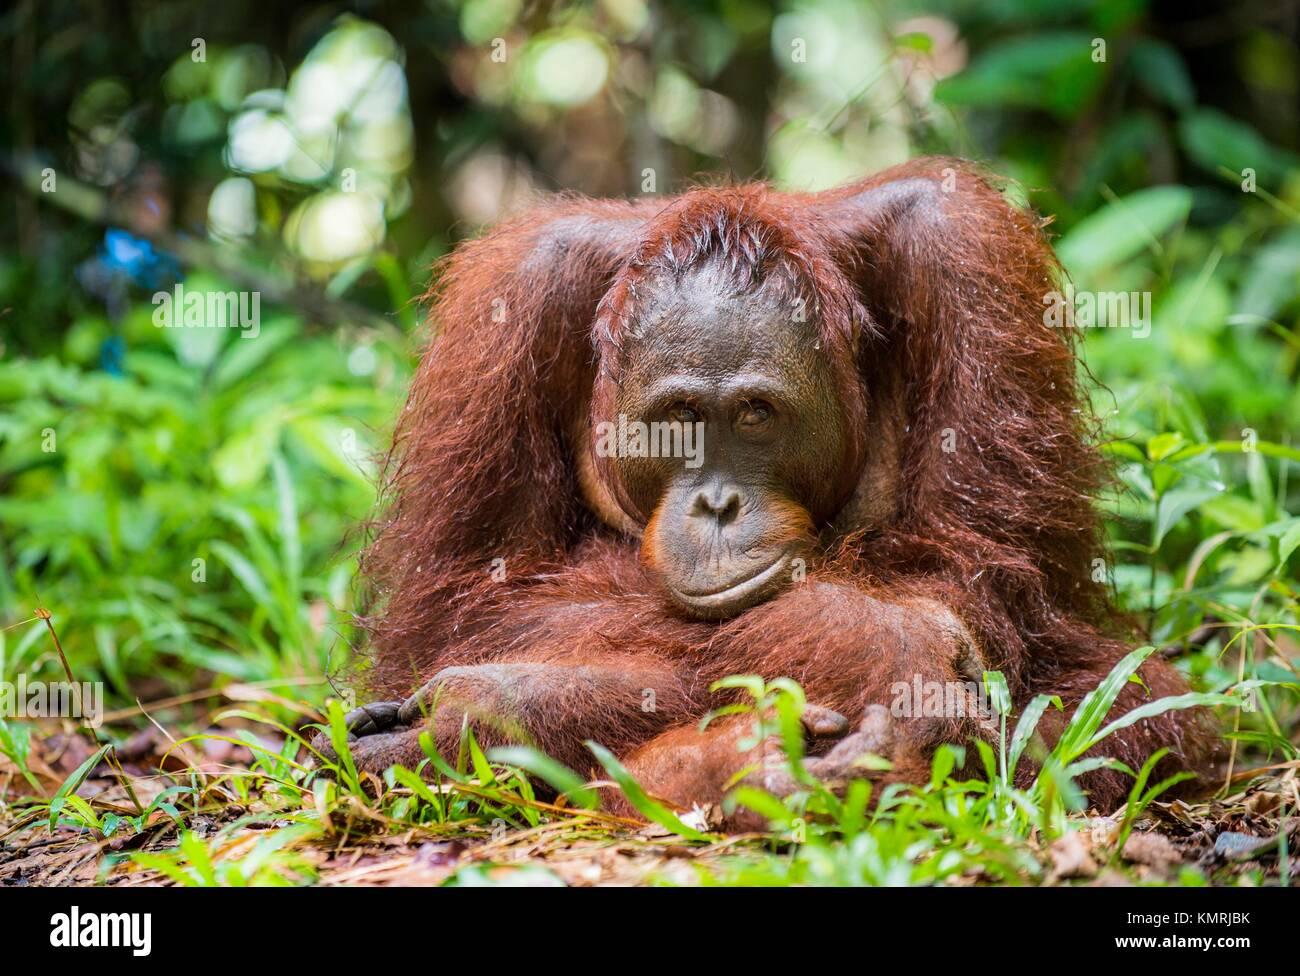 Bornean orangutan (Pongo pygmaeus) in the wild nature. Central Bornean orangutan ( Pongo pygmaeus wurmbii ) in natural - Stock Image